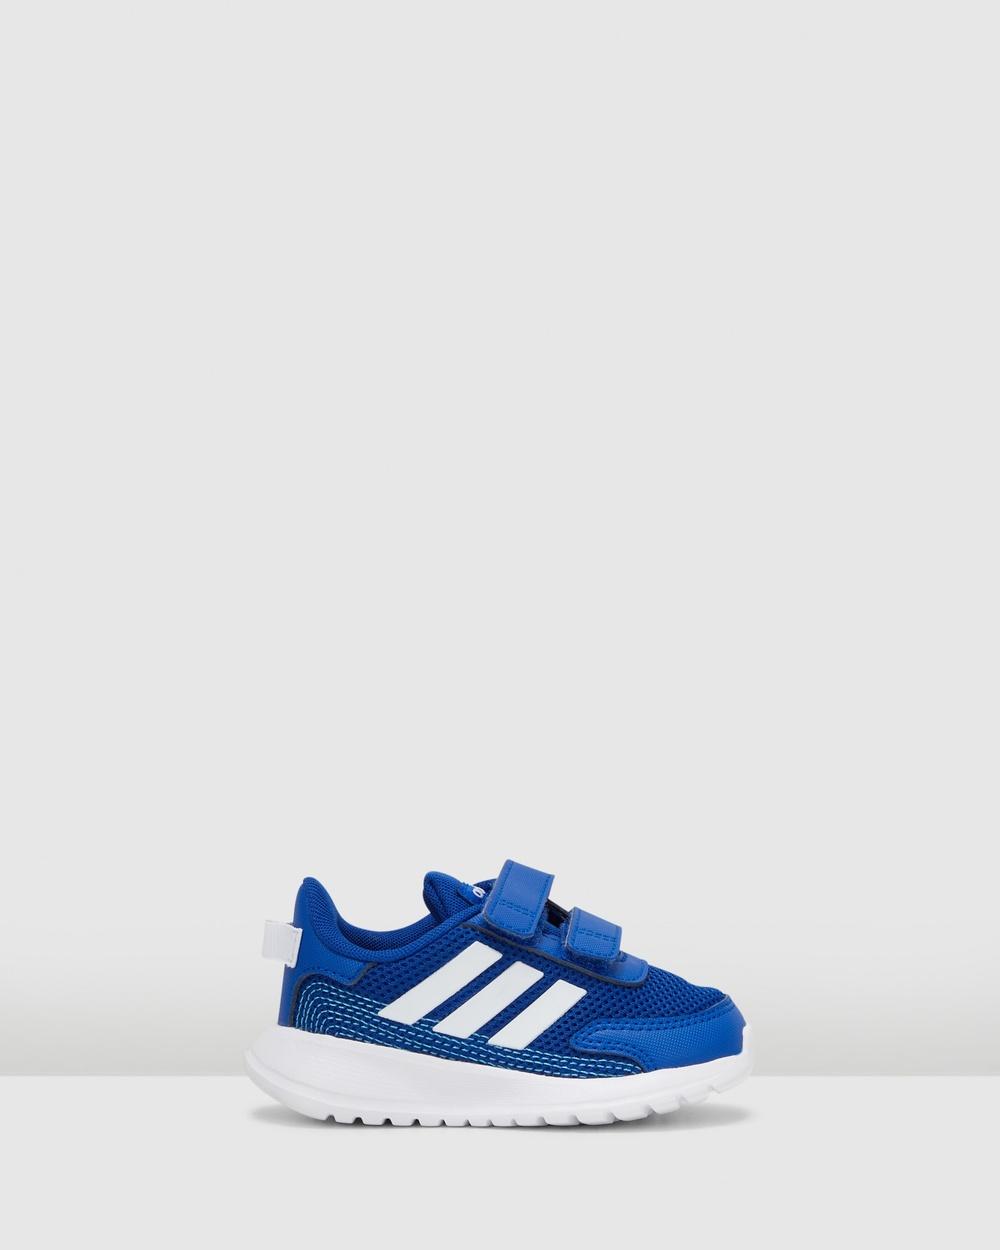 adidas Performance Tensaur Run Infant Lifestyle Shoes Royal Blue/White